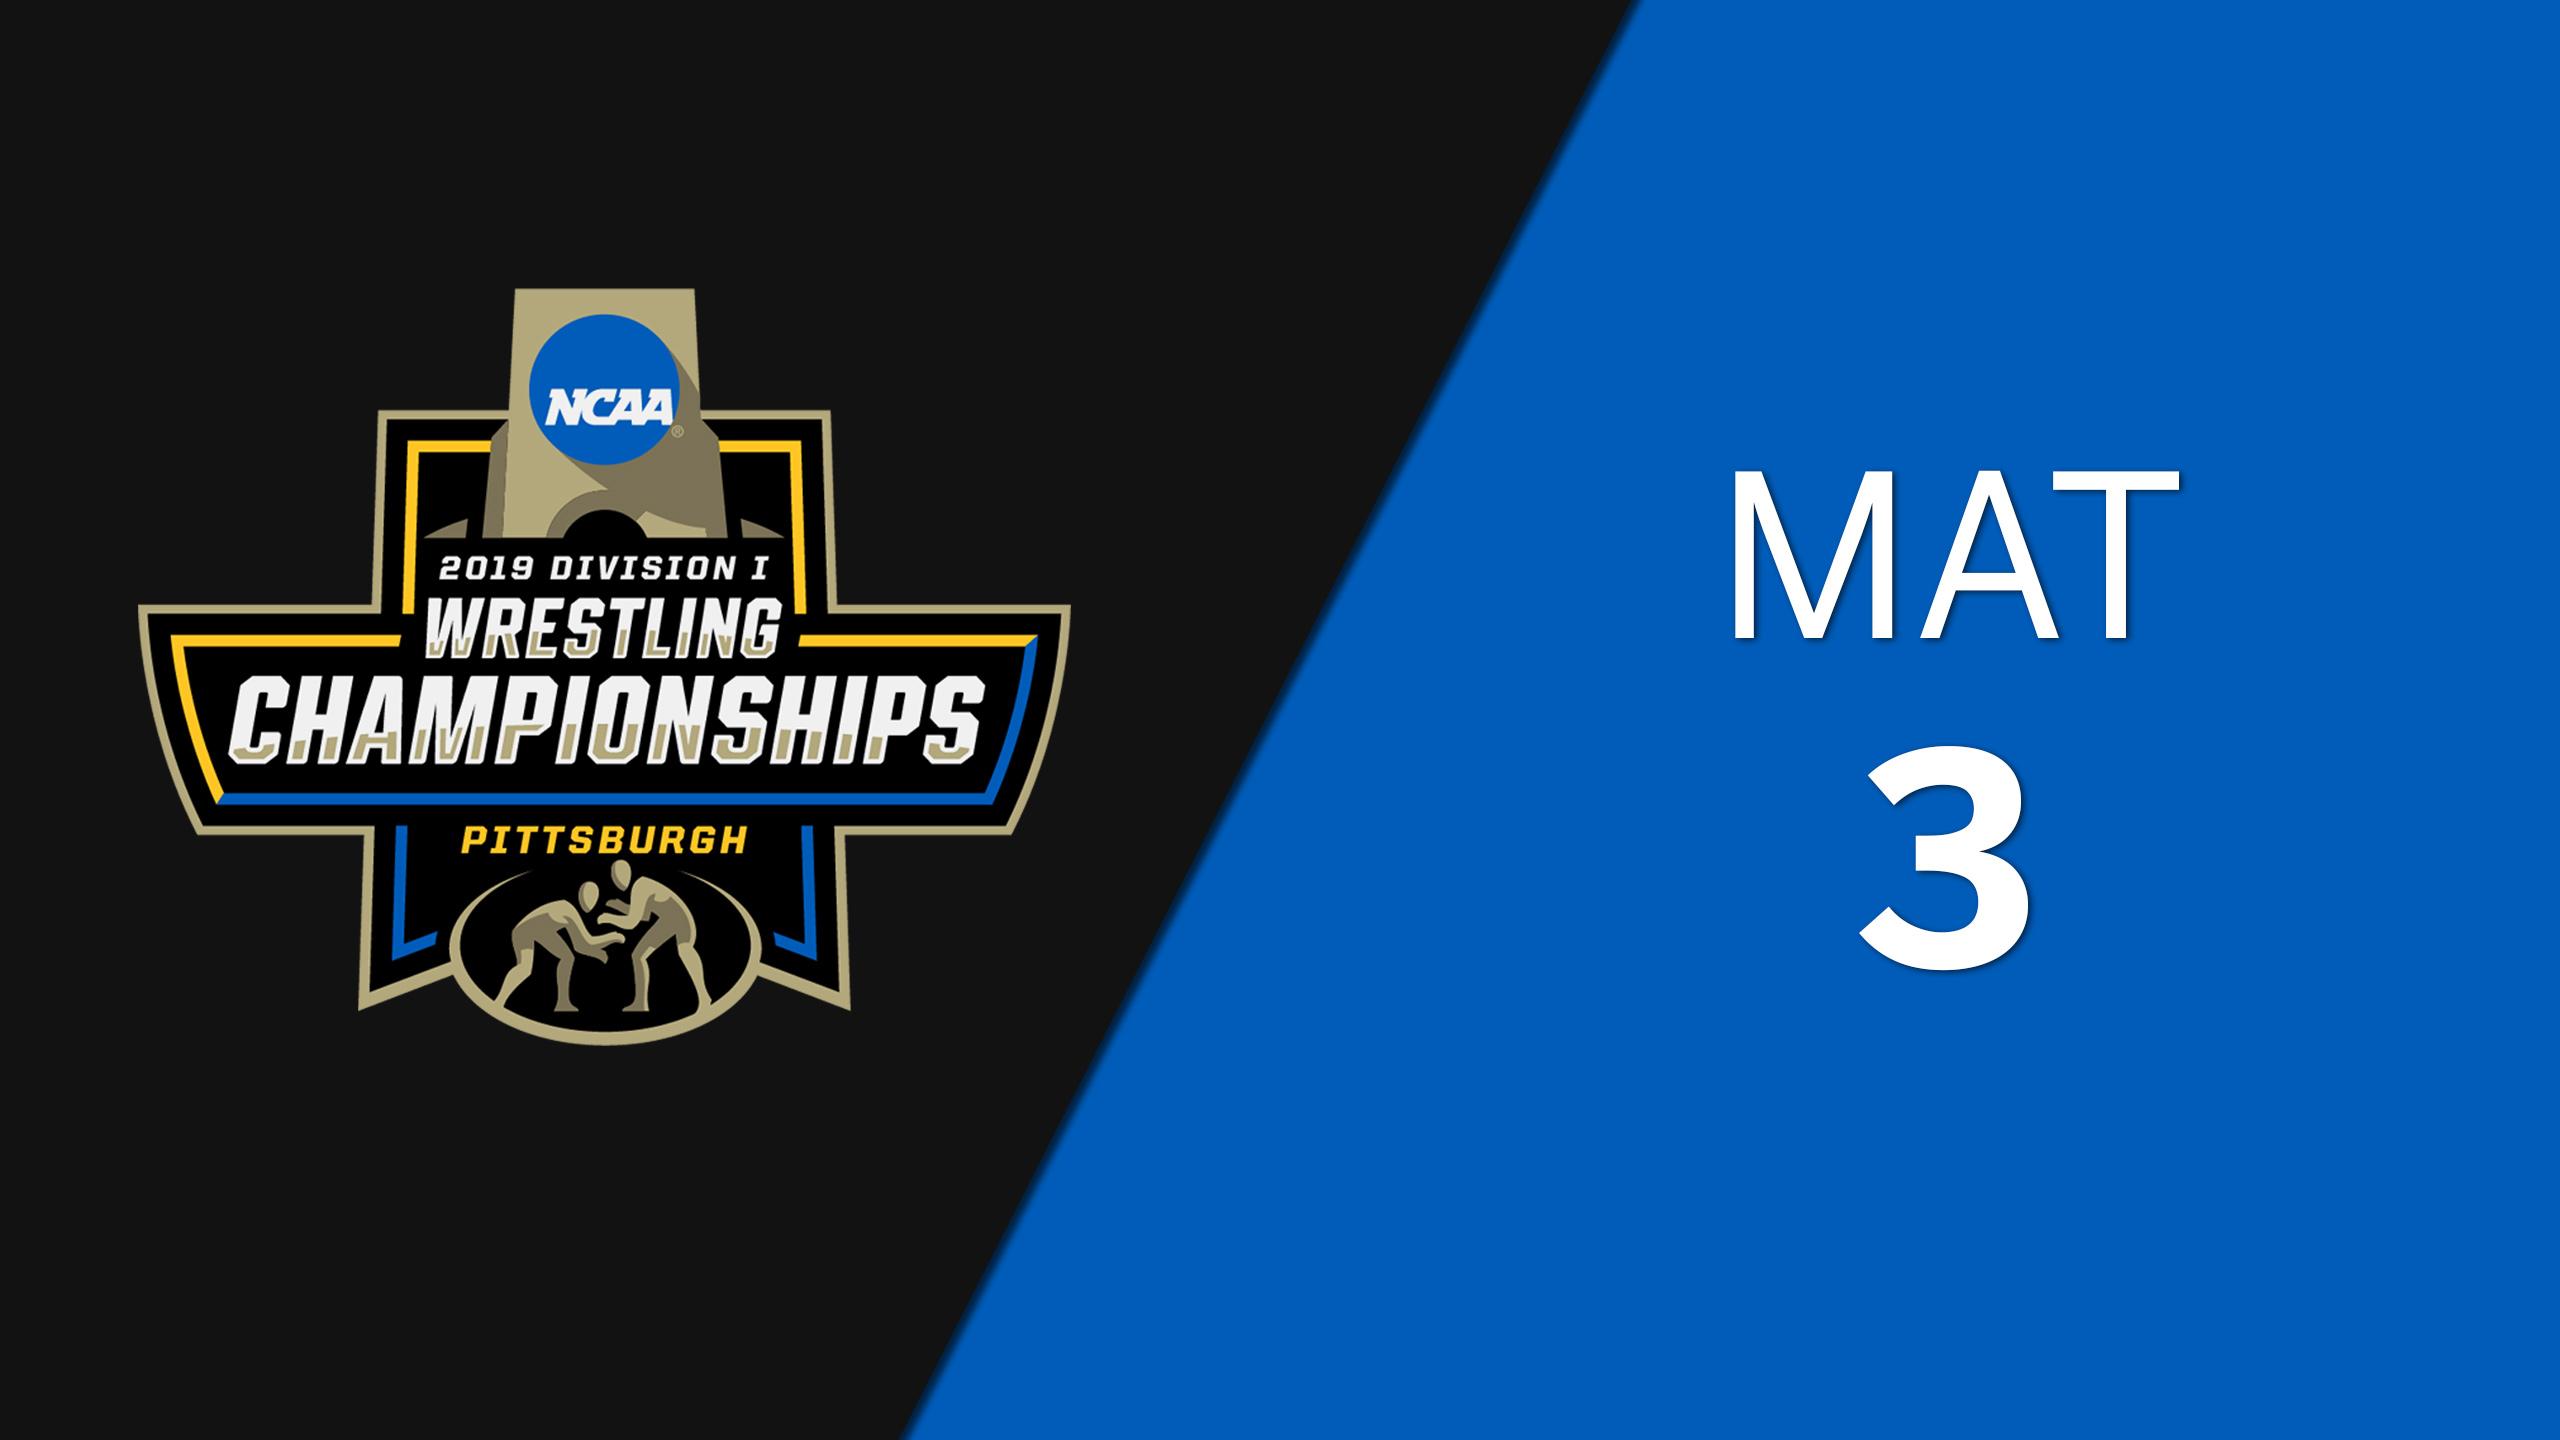 NCAA Wrestling Championship (Mat 3, Semifinals)